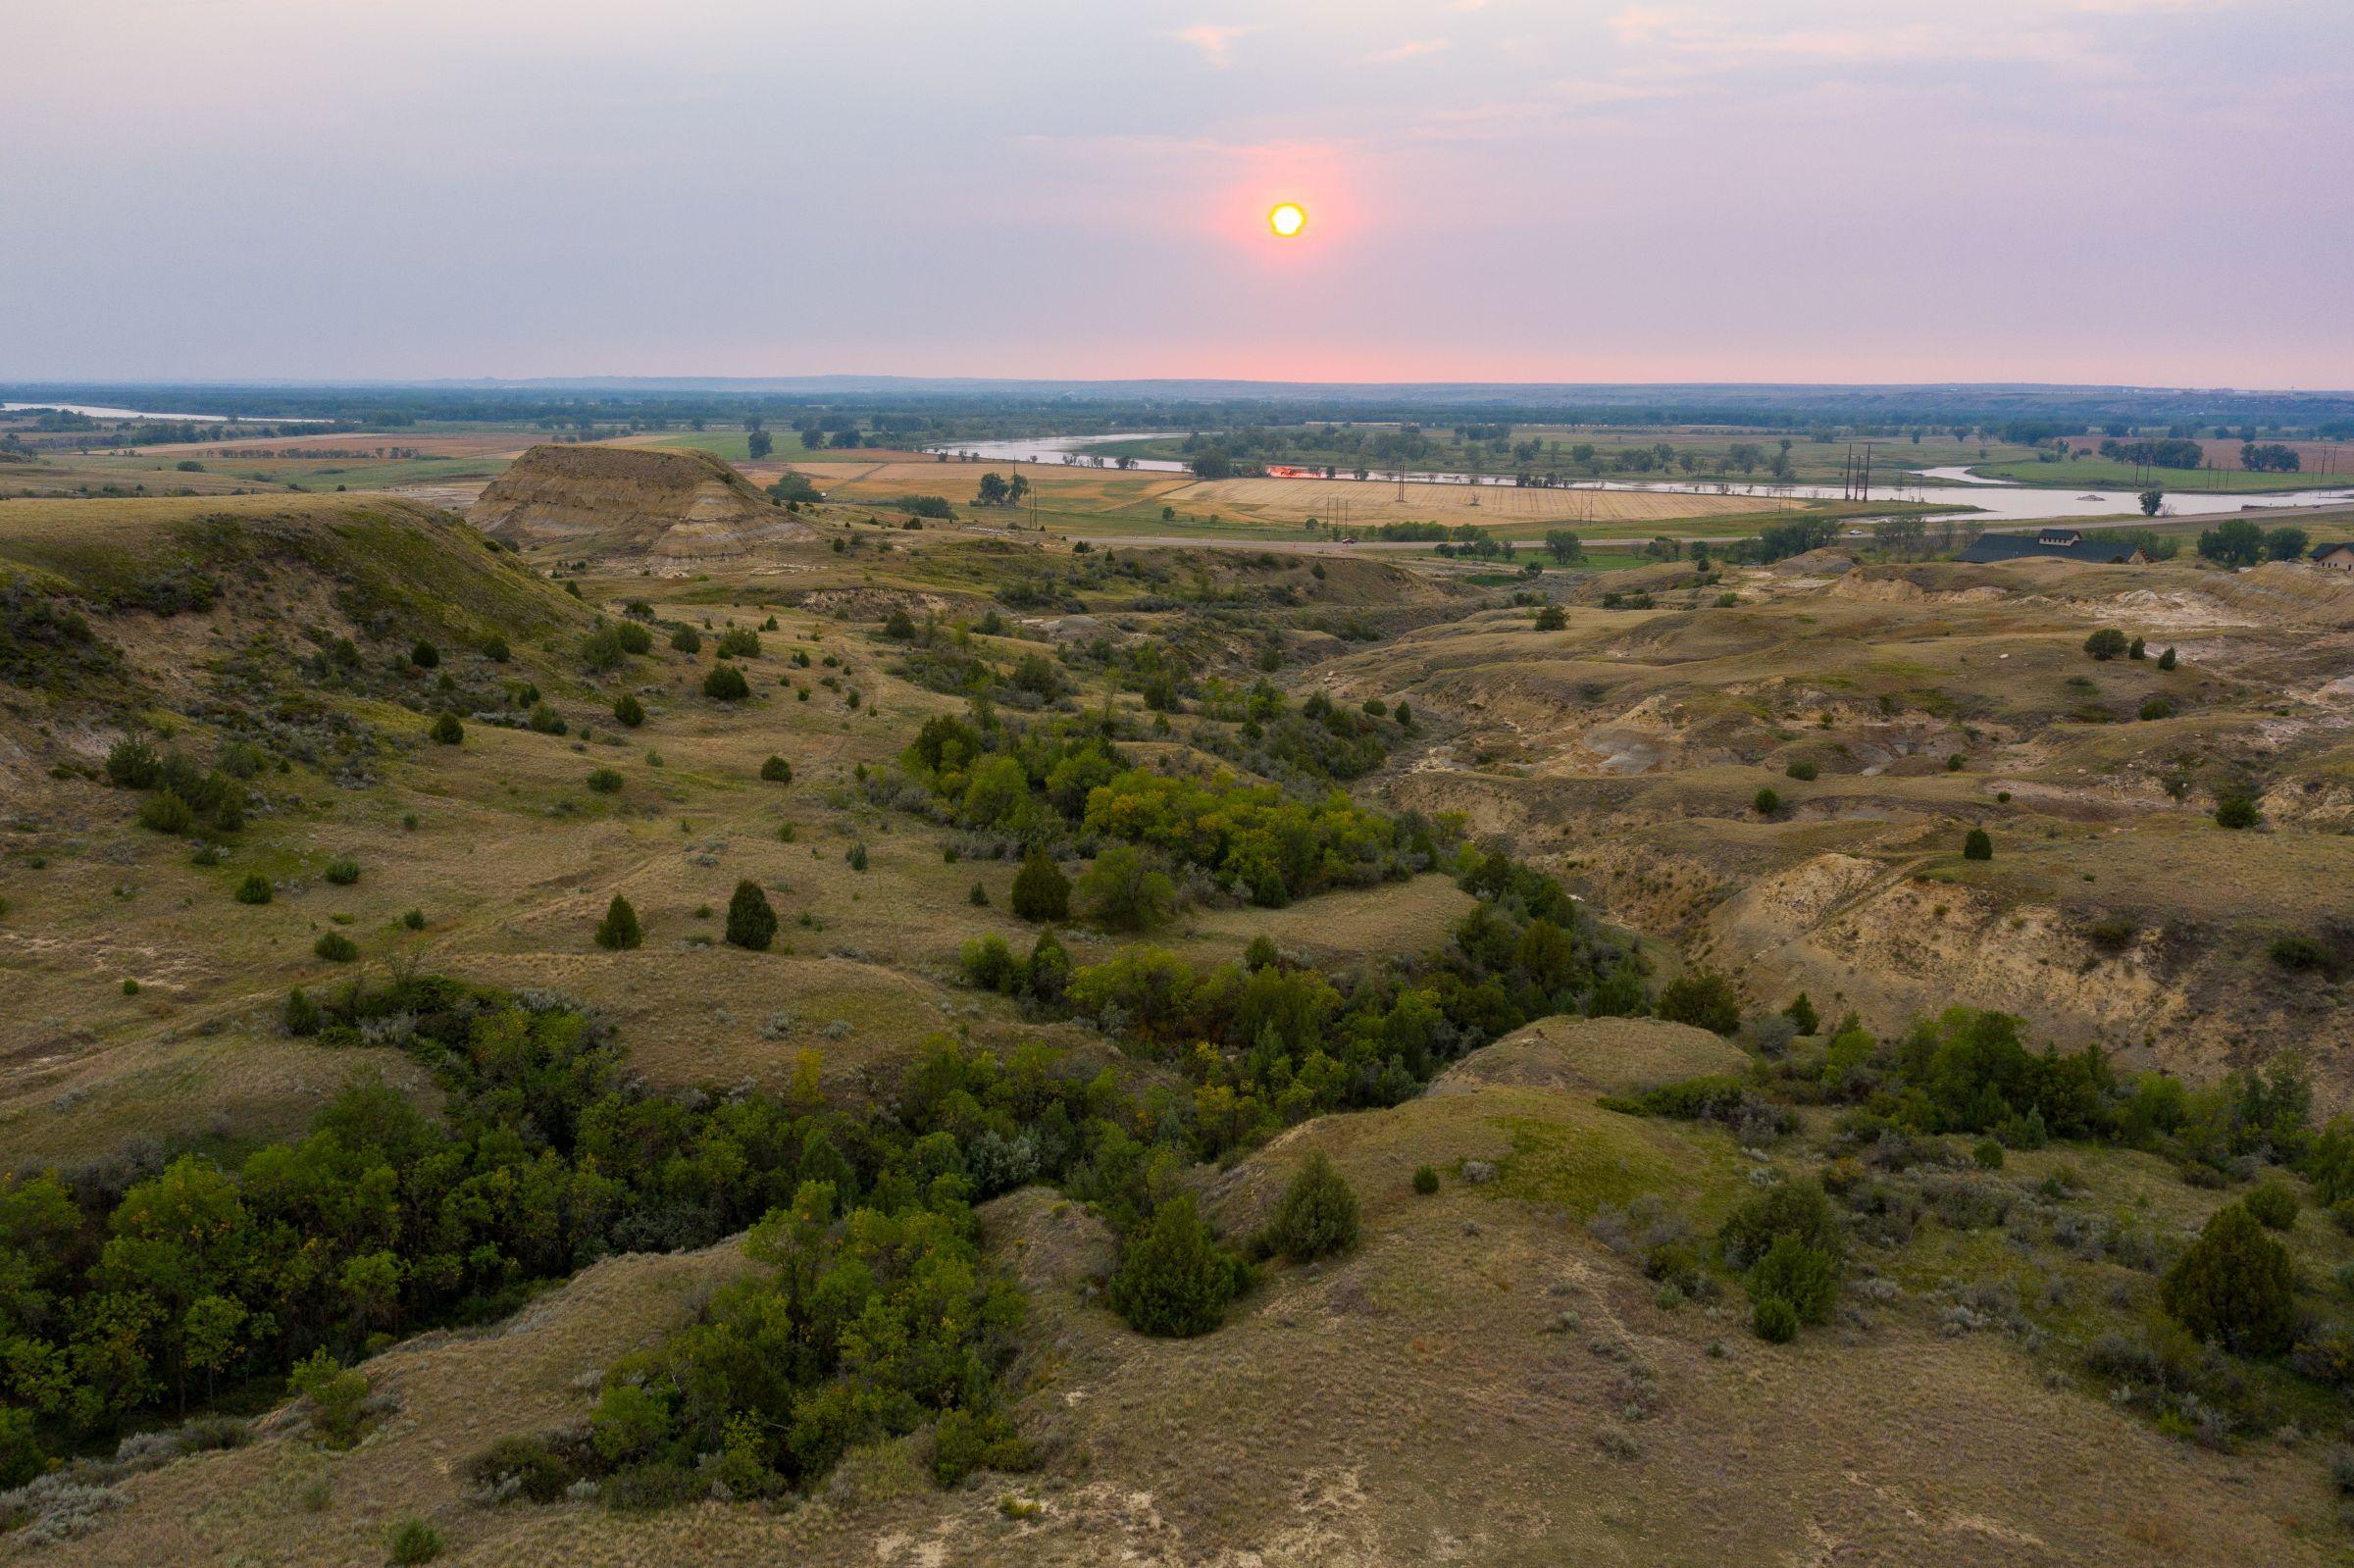 auctions-land-mckenzie-county-north-dakota-270-acres-listing-number-15735-3-2021-09-09-235147.jpeg